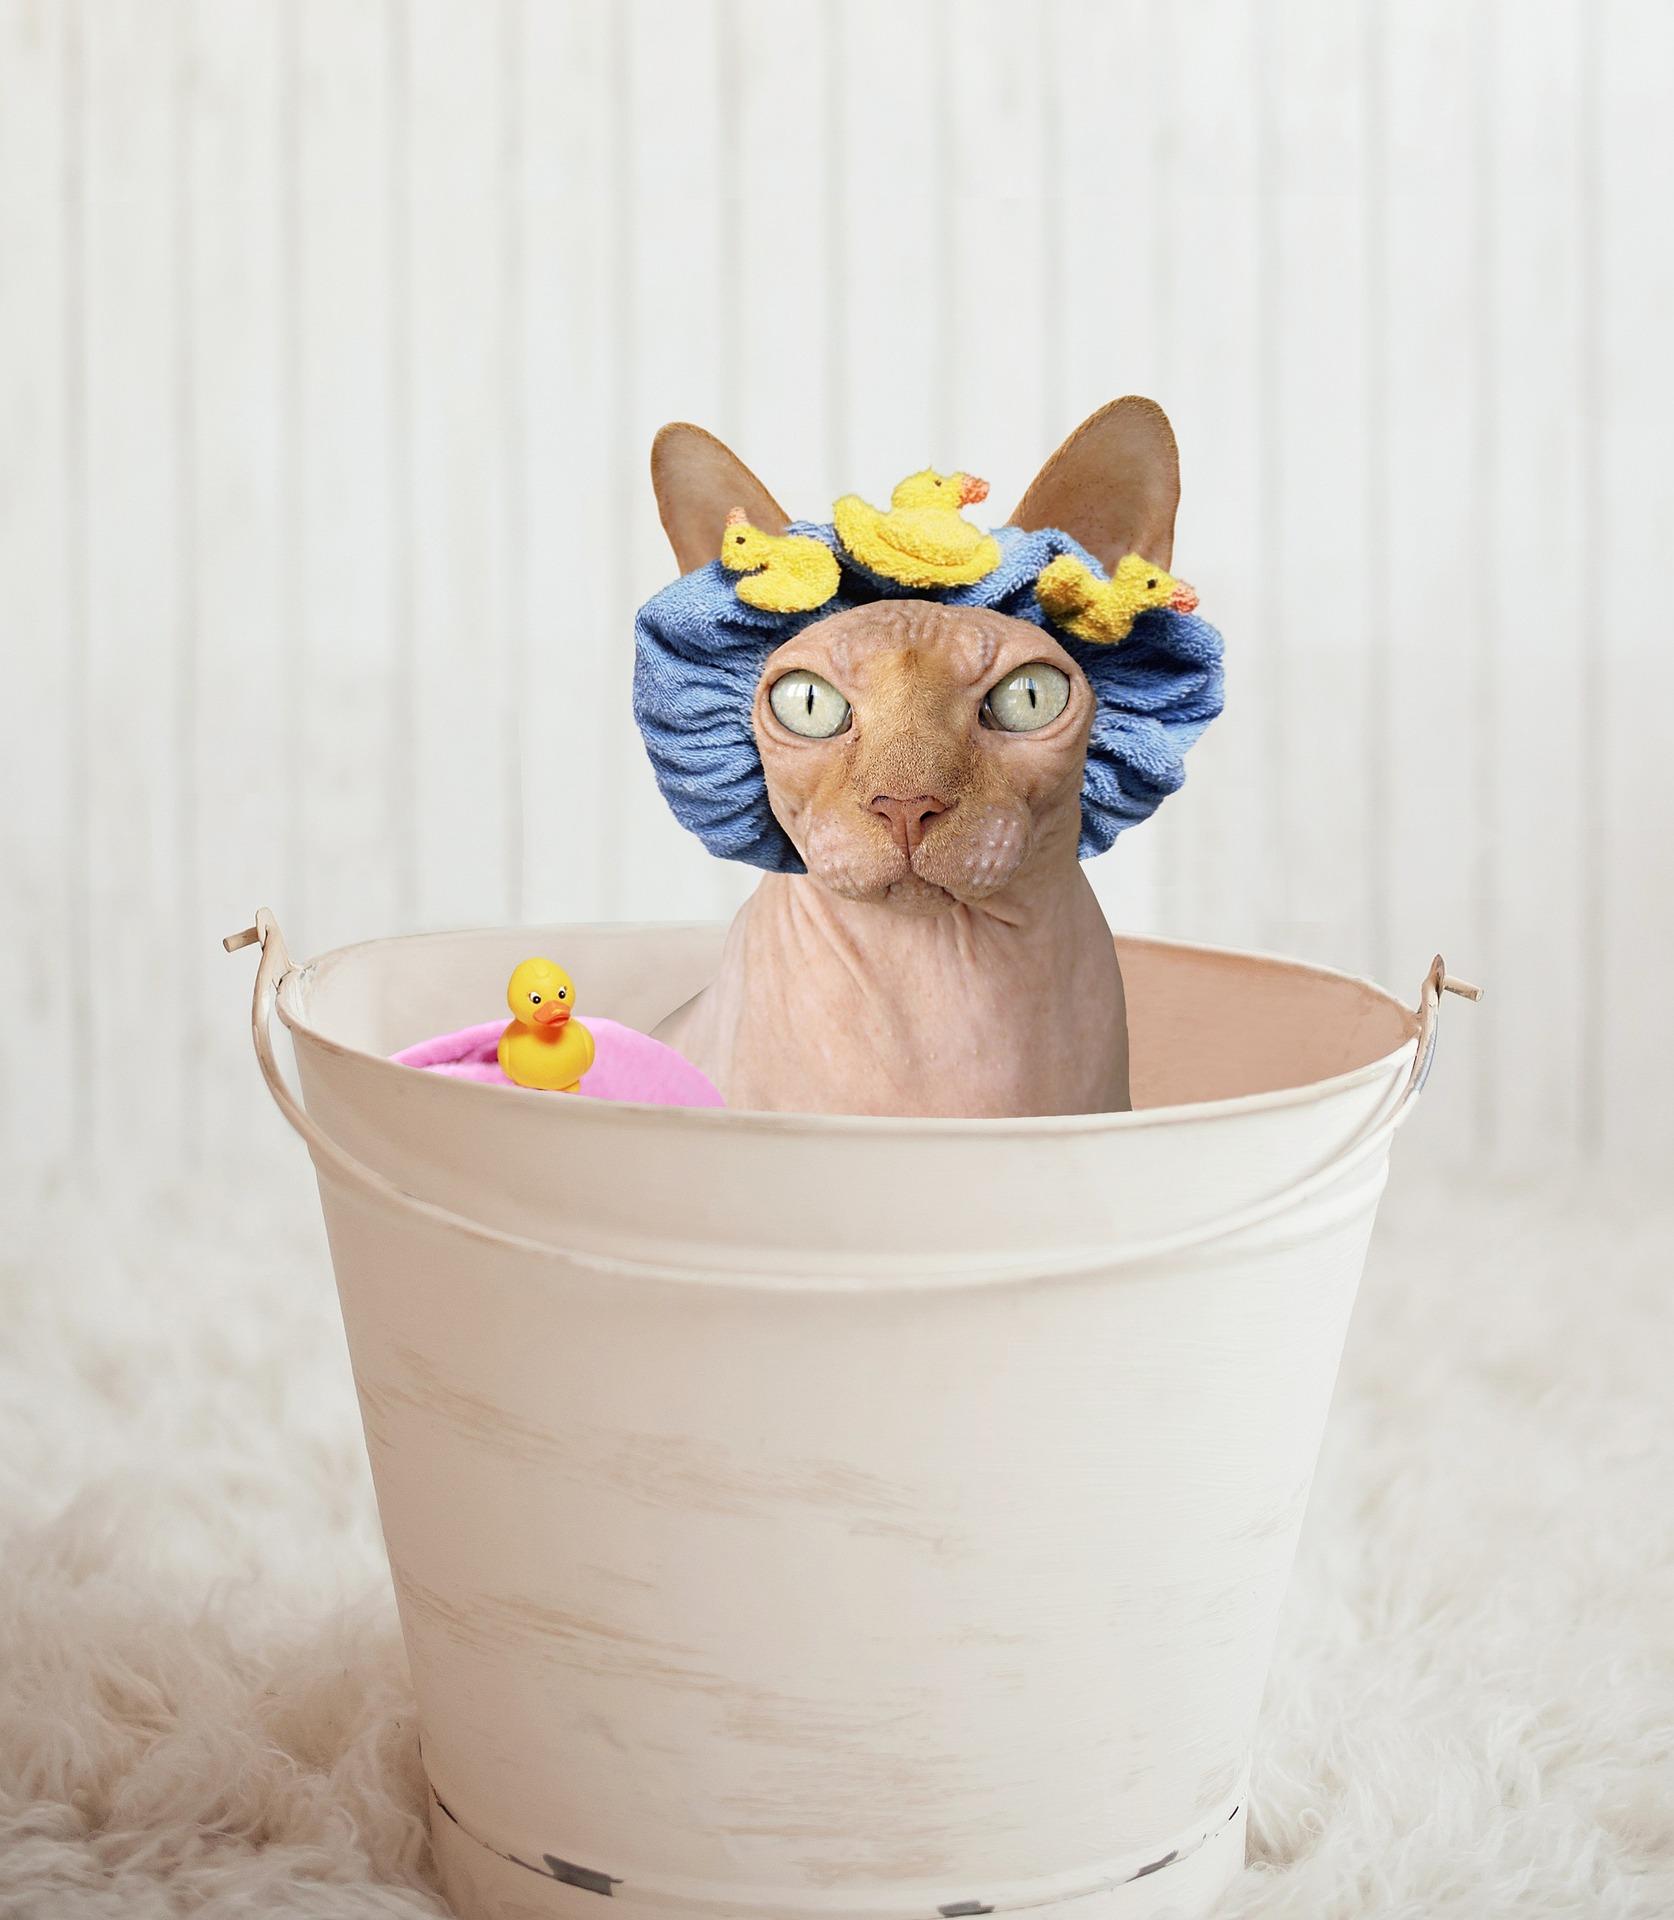 sphinx bath funny tub bucket hairless